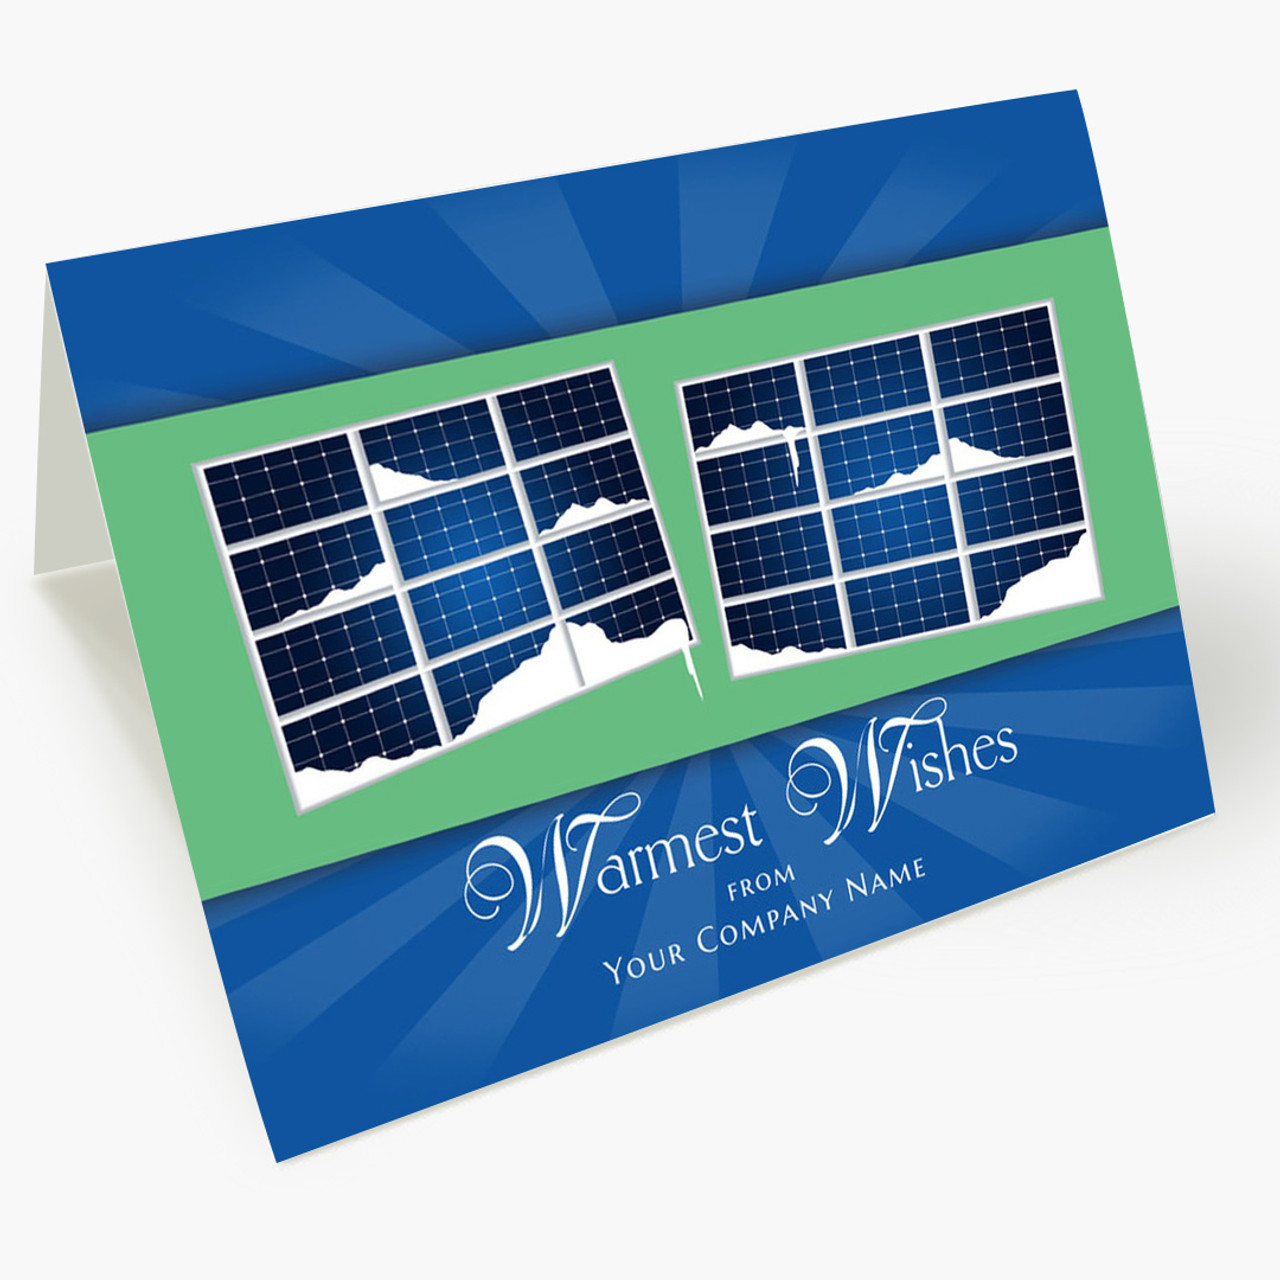 Solar Warm Wishes Christmas Card